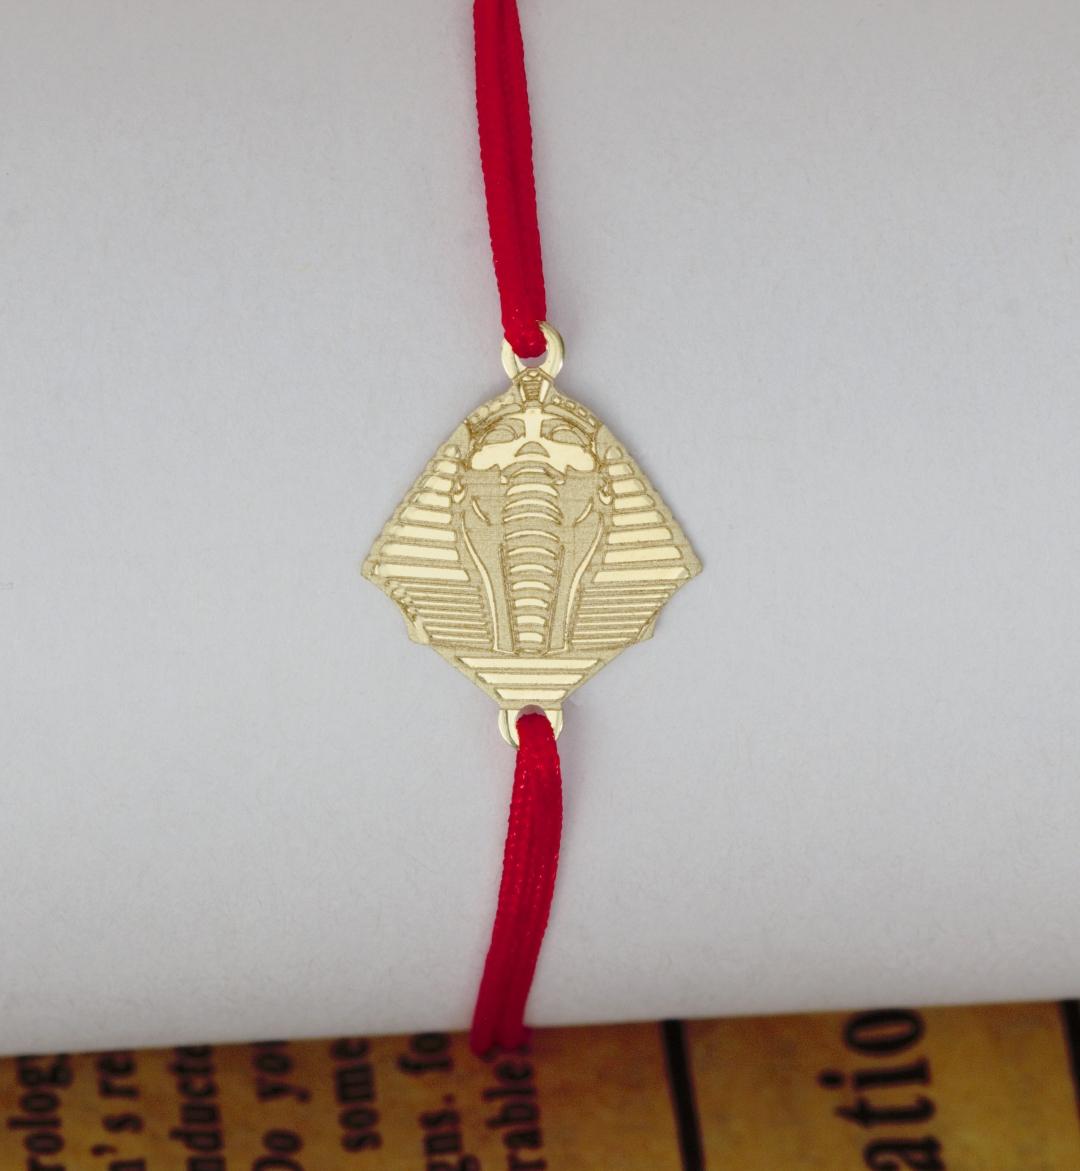 Bratara din aur 14k si simbol egipt faraon – cu snur reglabil